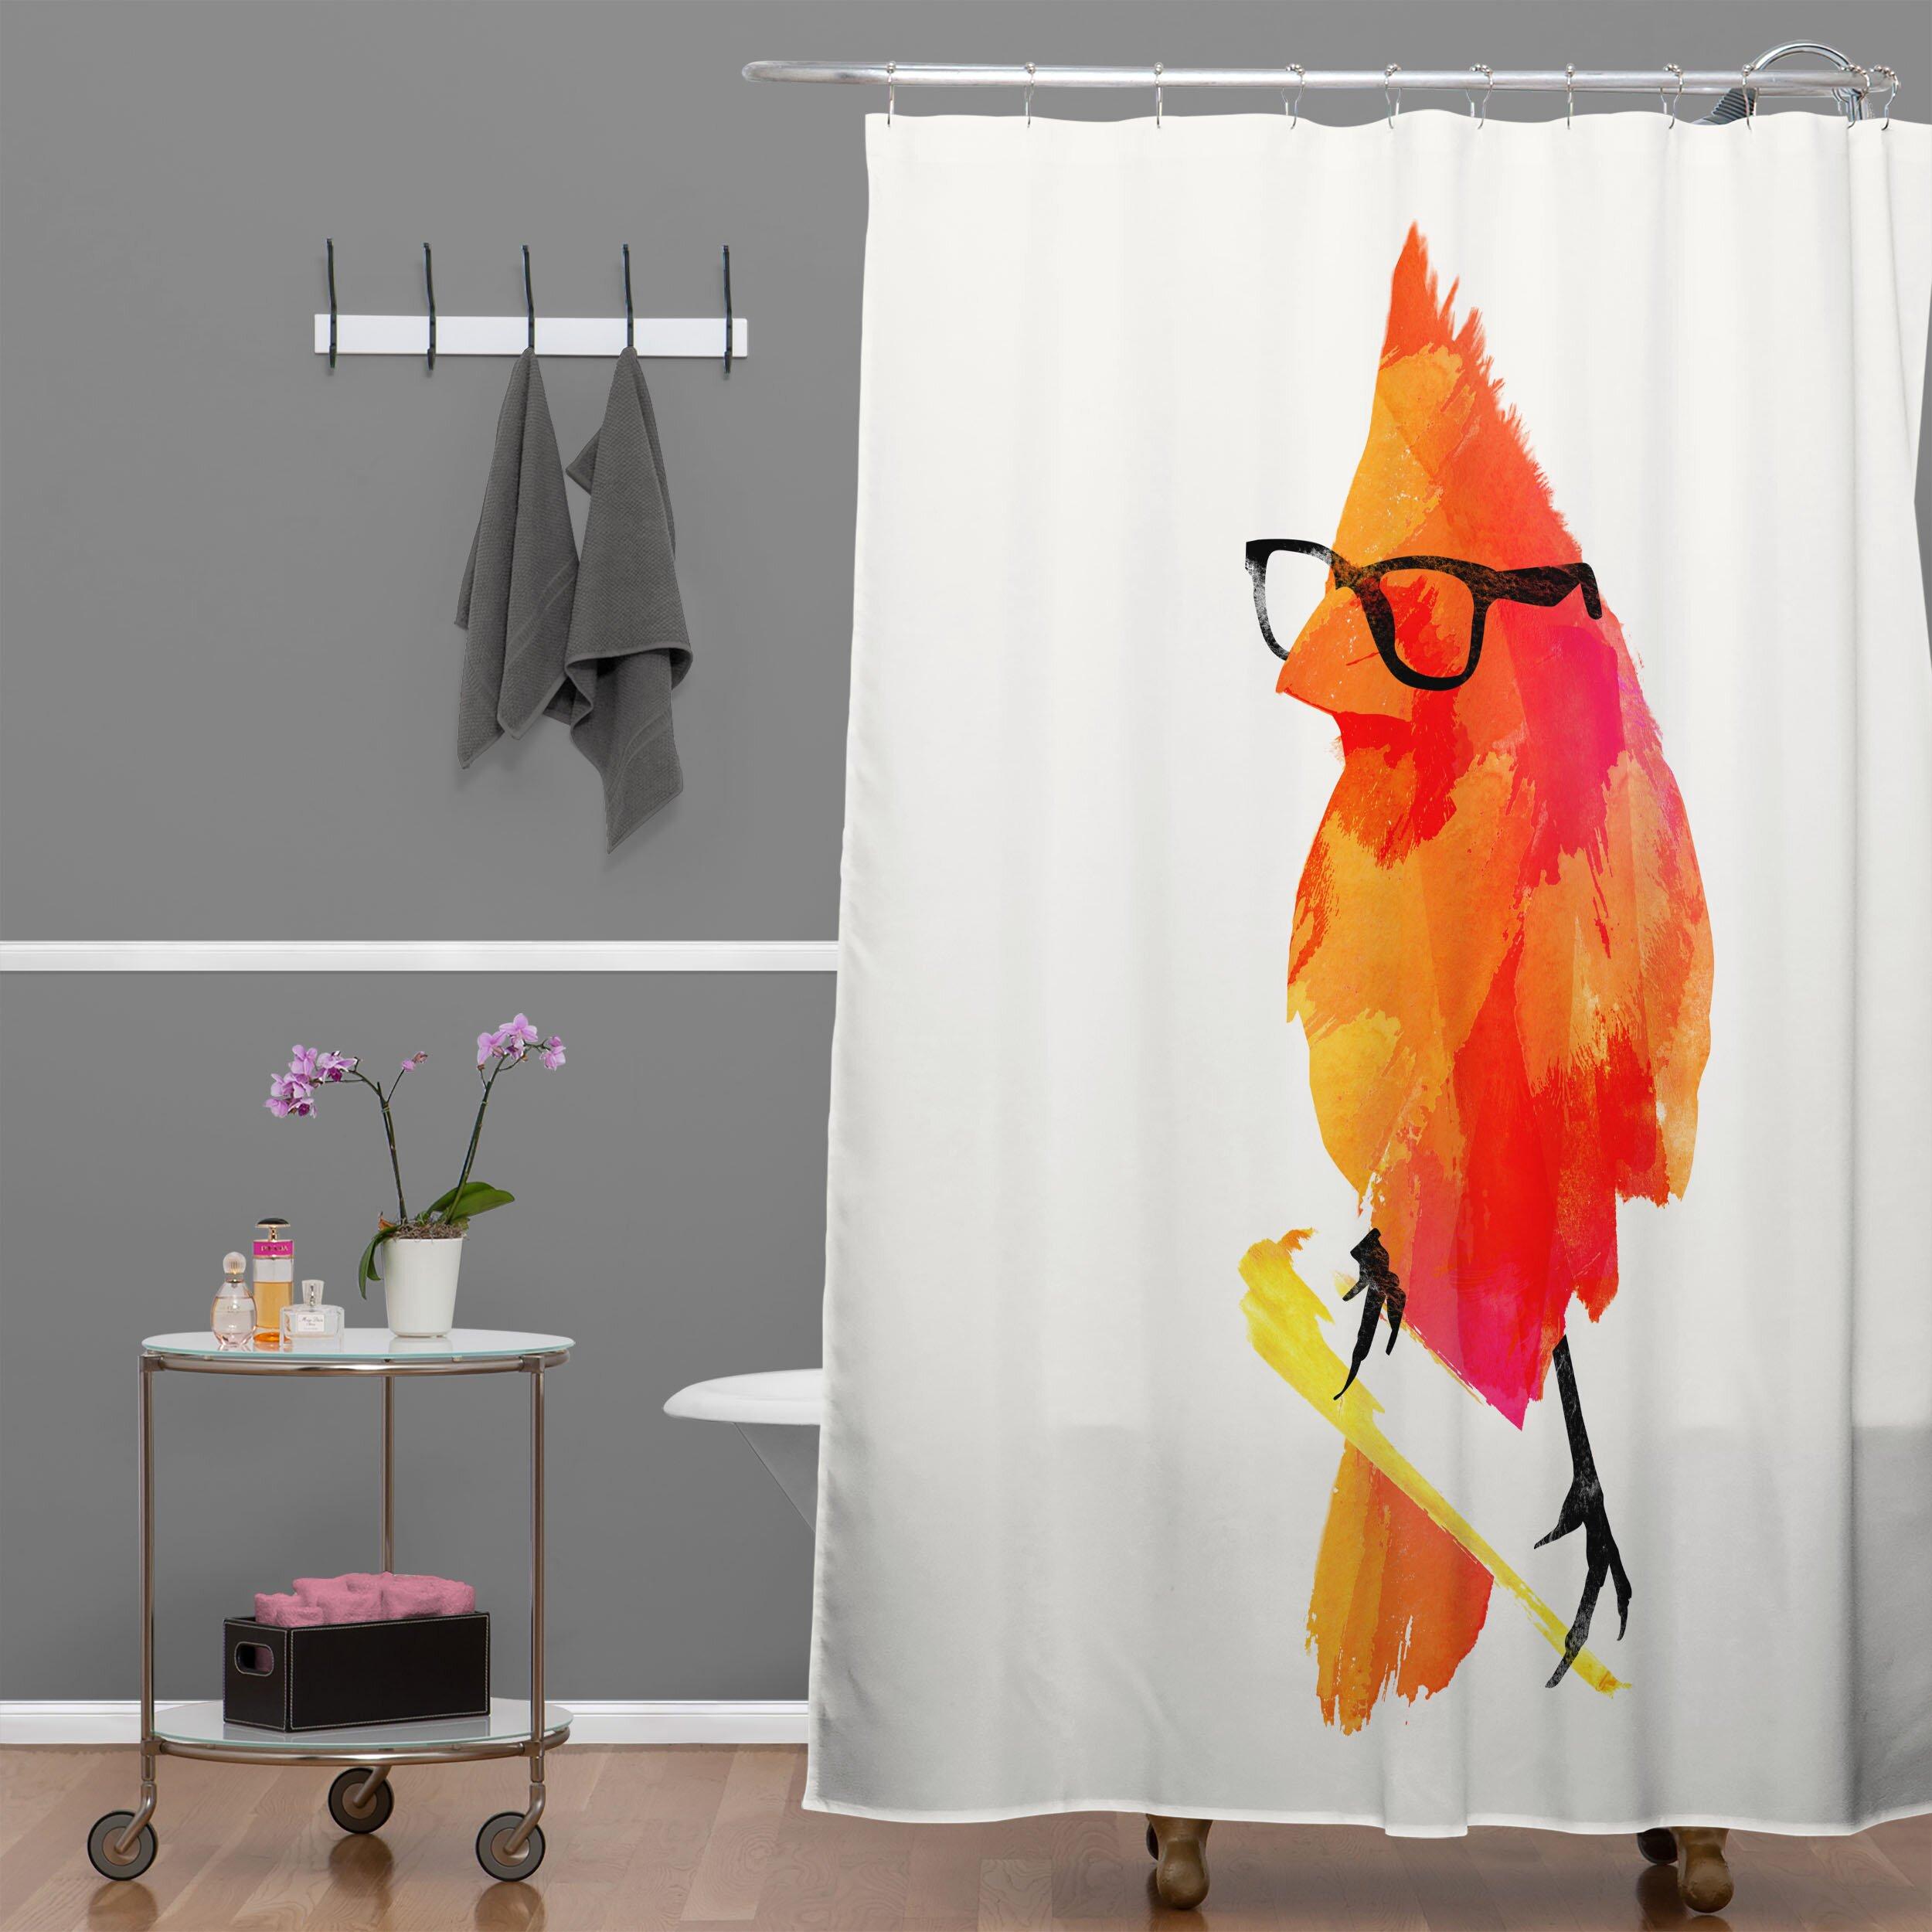 Kraken shower curtain - Deny Designs Robert Farkas Punk Bird Shower Curtain